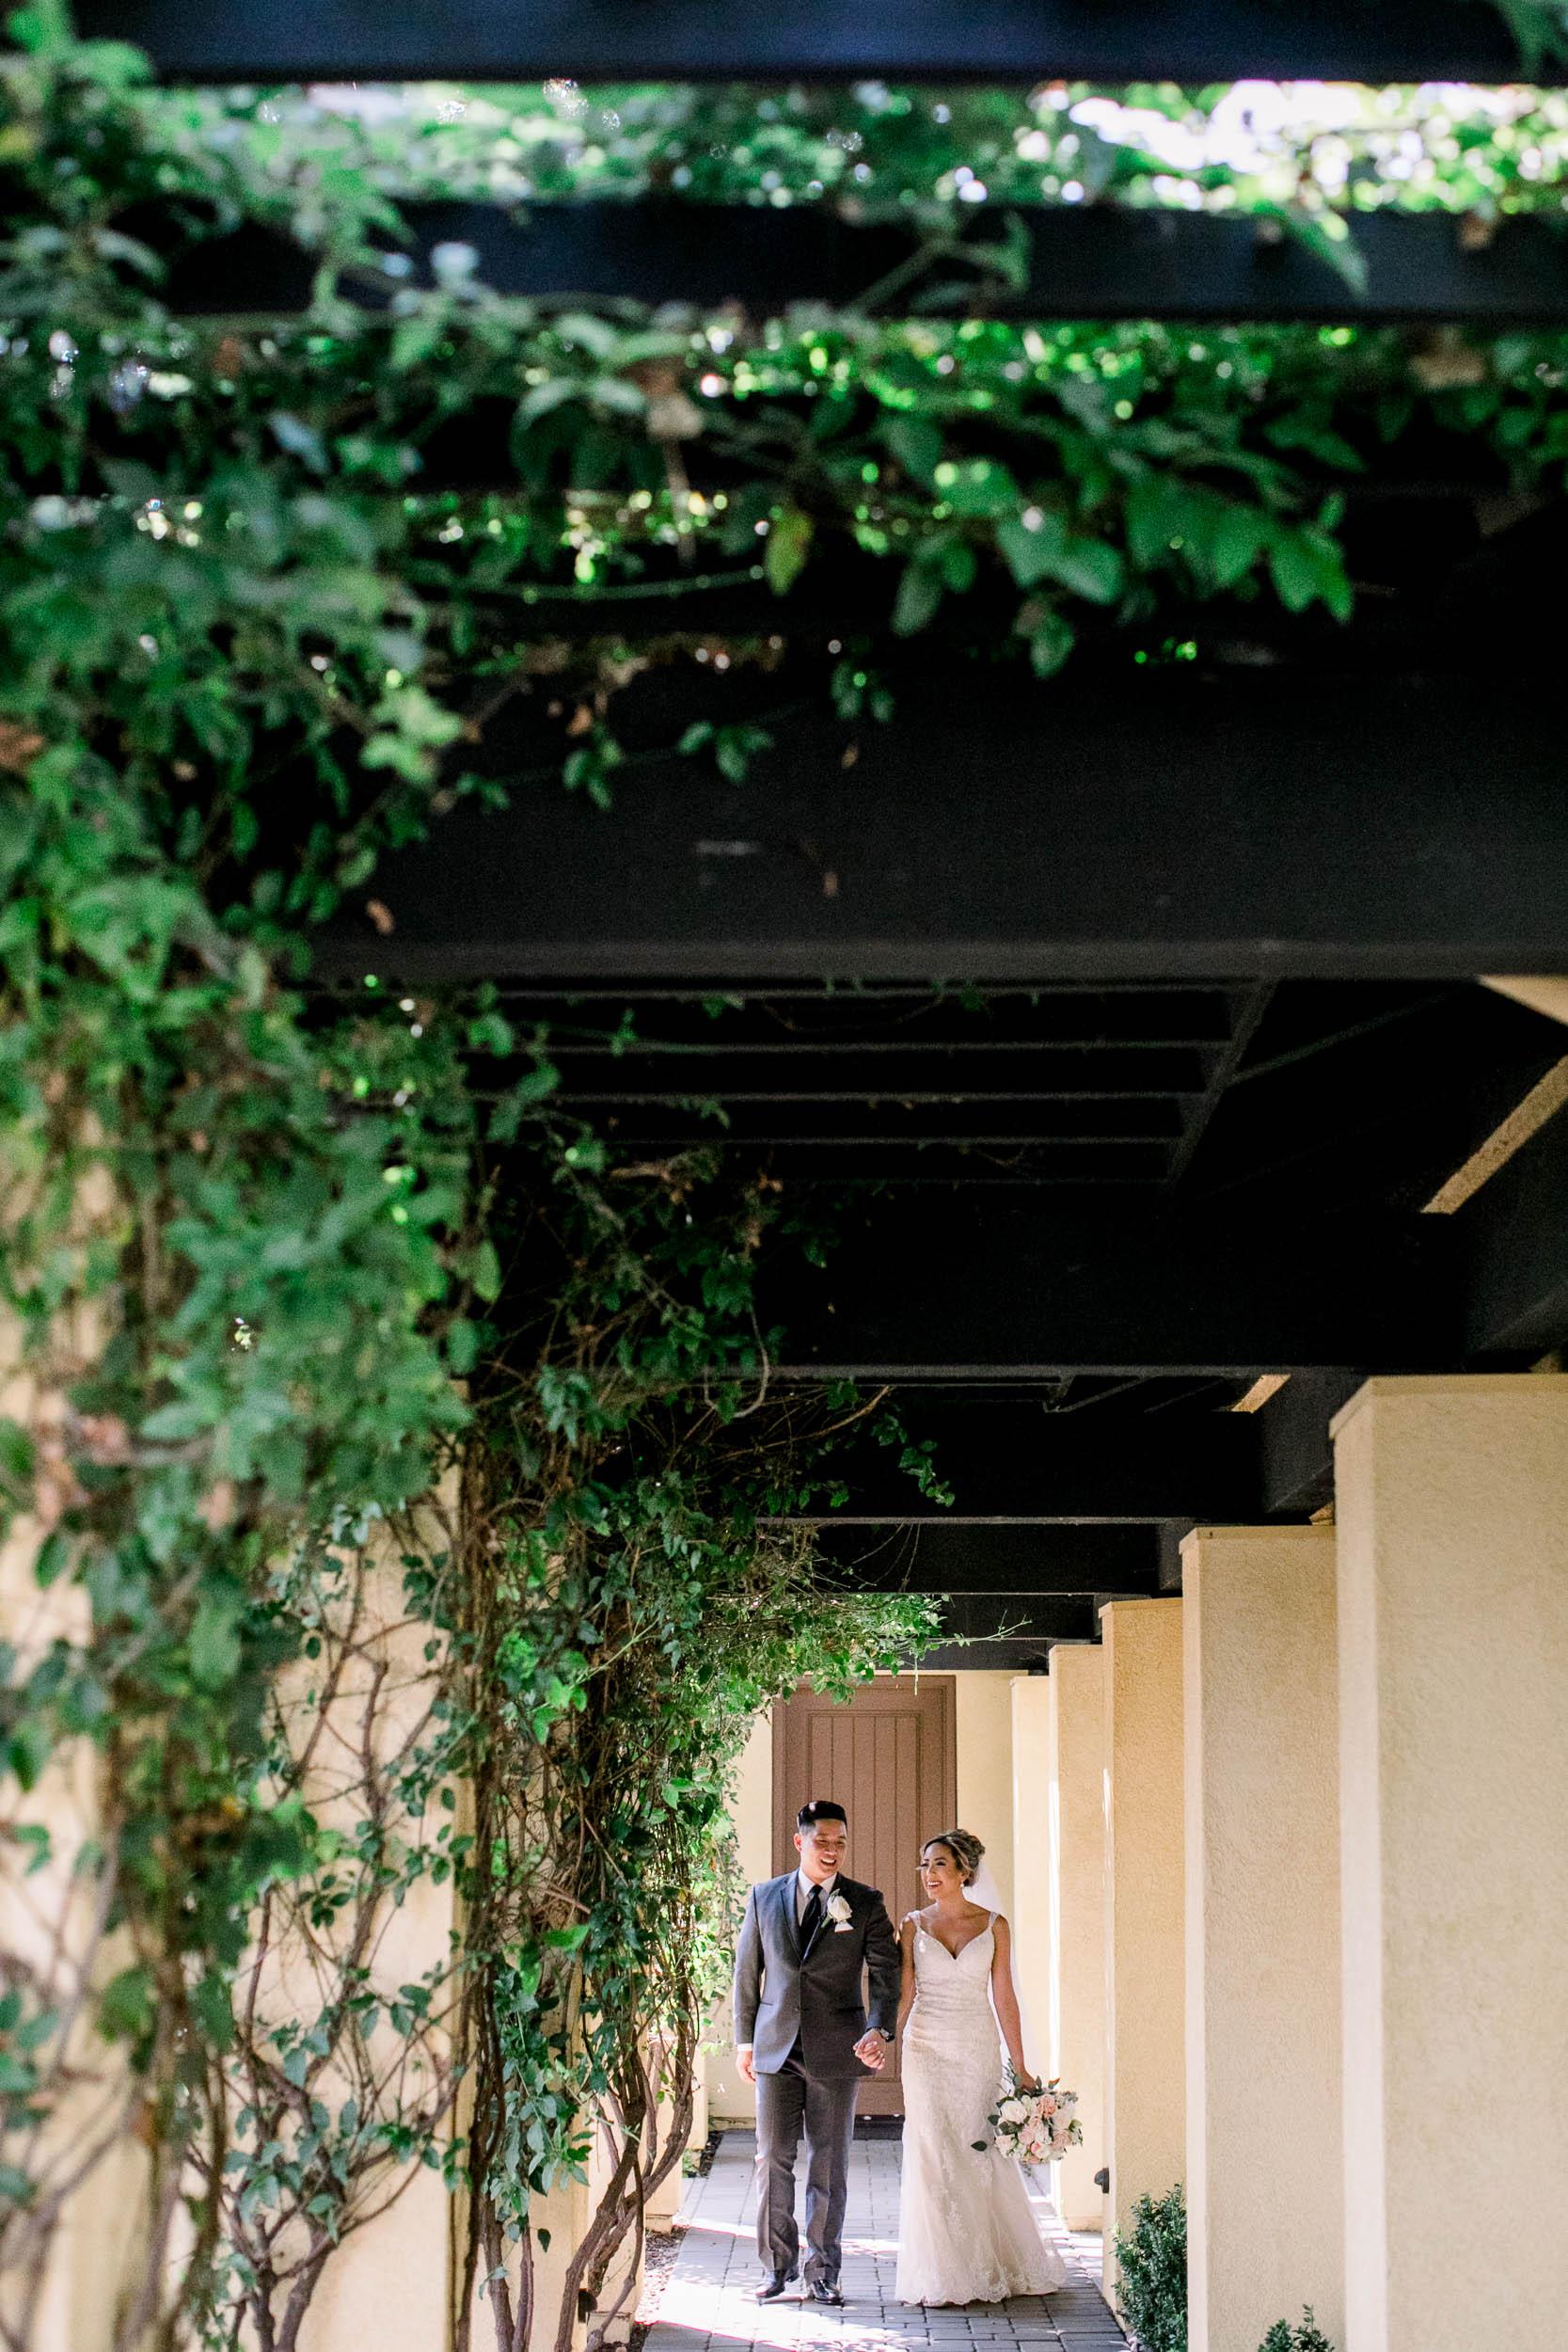 Las Positas Wedding_Buena Lane Photography_090118ER160.jpg